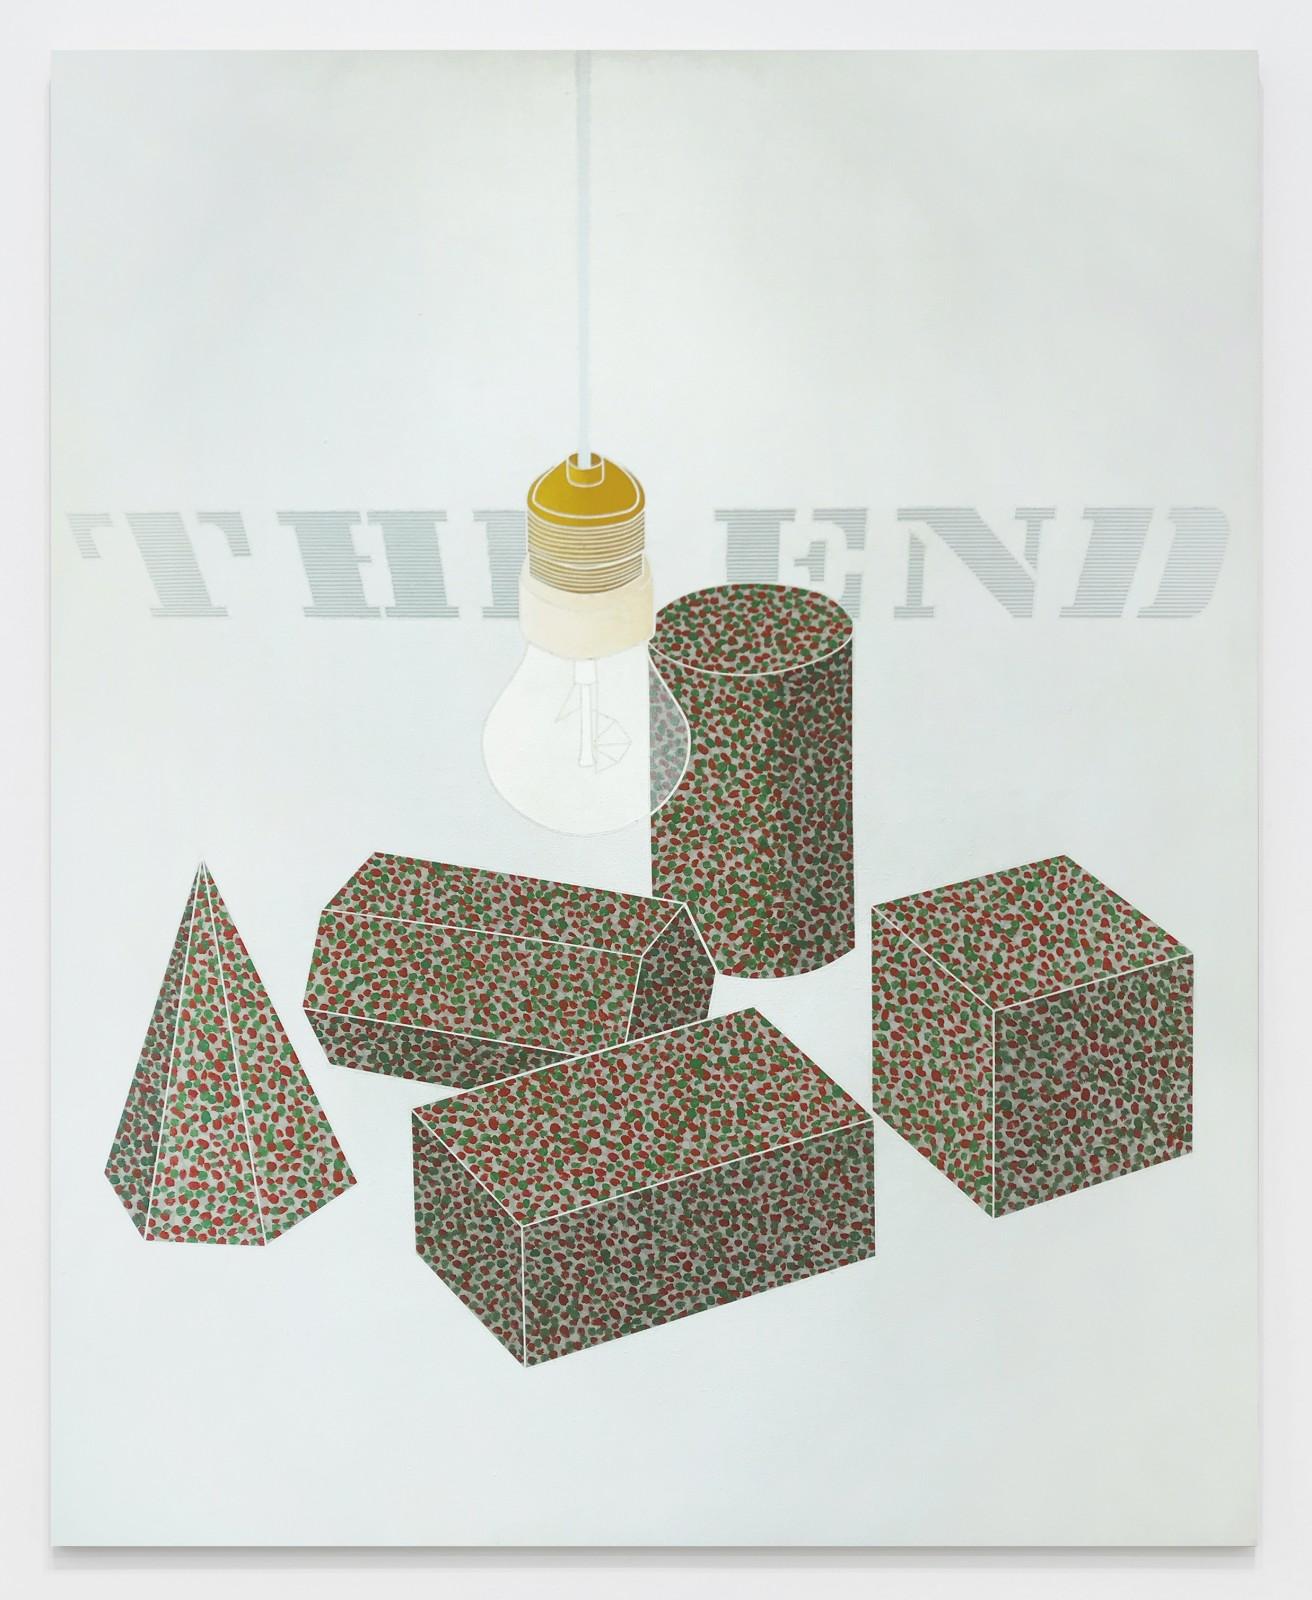 "<span class=""link fancybox-details-link""><a href=""/exhibitions/553/works/artworks_standalone11000/"">View Detail Page</a></span><div class=""artist""><span class=""artist""><strong>EMILIO TADINI</strong></span></div><div class=""title""><em>Paesaggio Occidentale / Western Landscape</em>, 1969</div><div class=""medium"">Acrylic on canvas</div><div class=""dimensions"">162 x 130 cm<br>63 ¾ x 51 ⅛ inches</div><div class=""price price_unavailable"">Sold</div>"